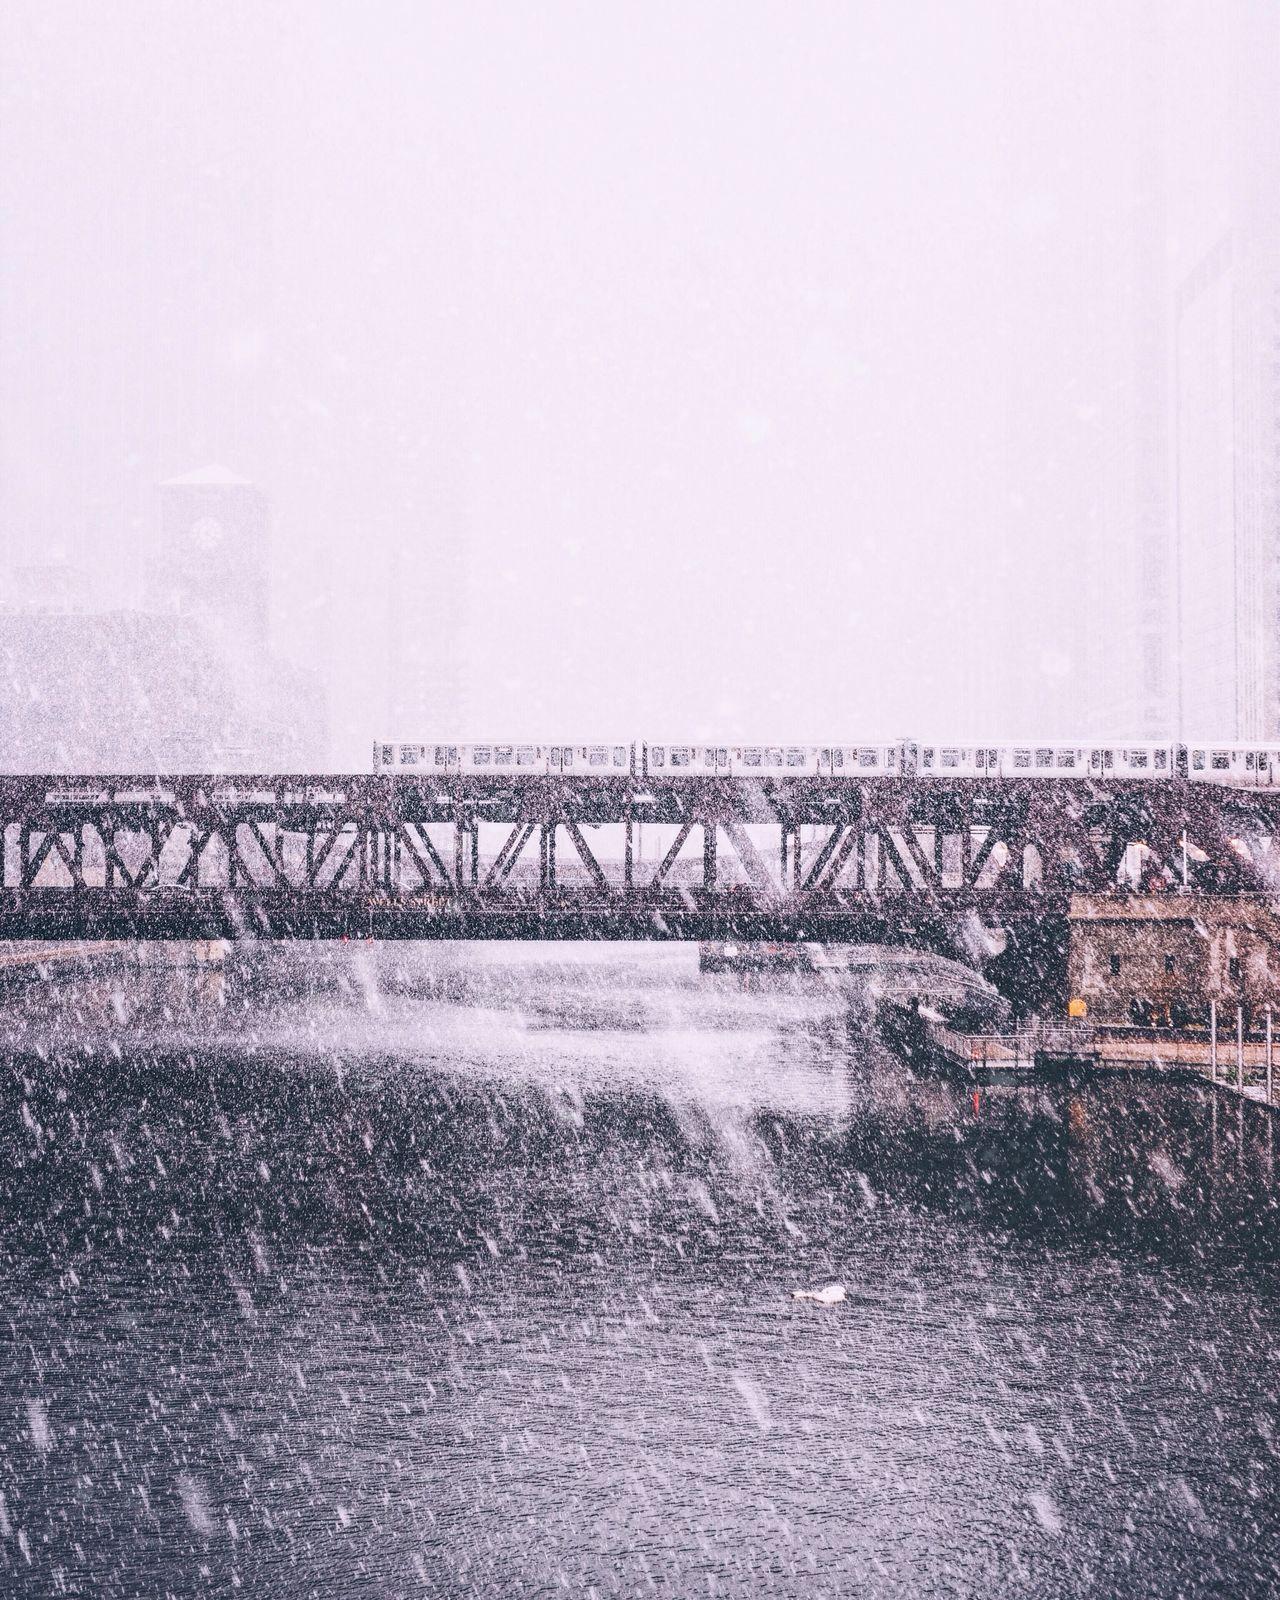 Built Structure No People Architecture Bridge - Man Made Structure Winter EyeEm Best Shots Chicago Snow Lake Effect